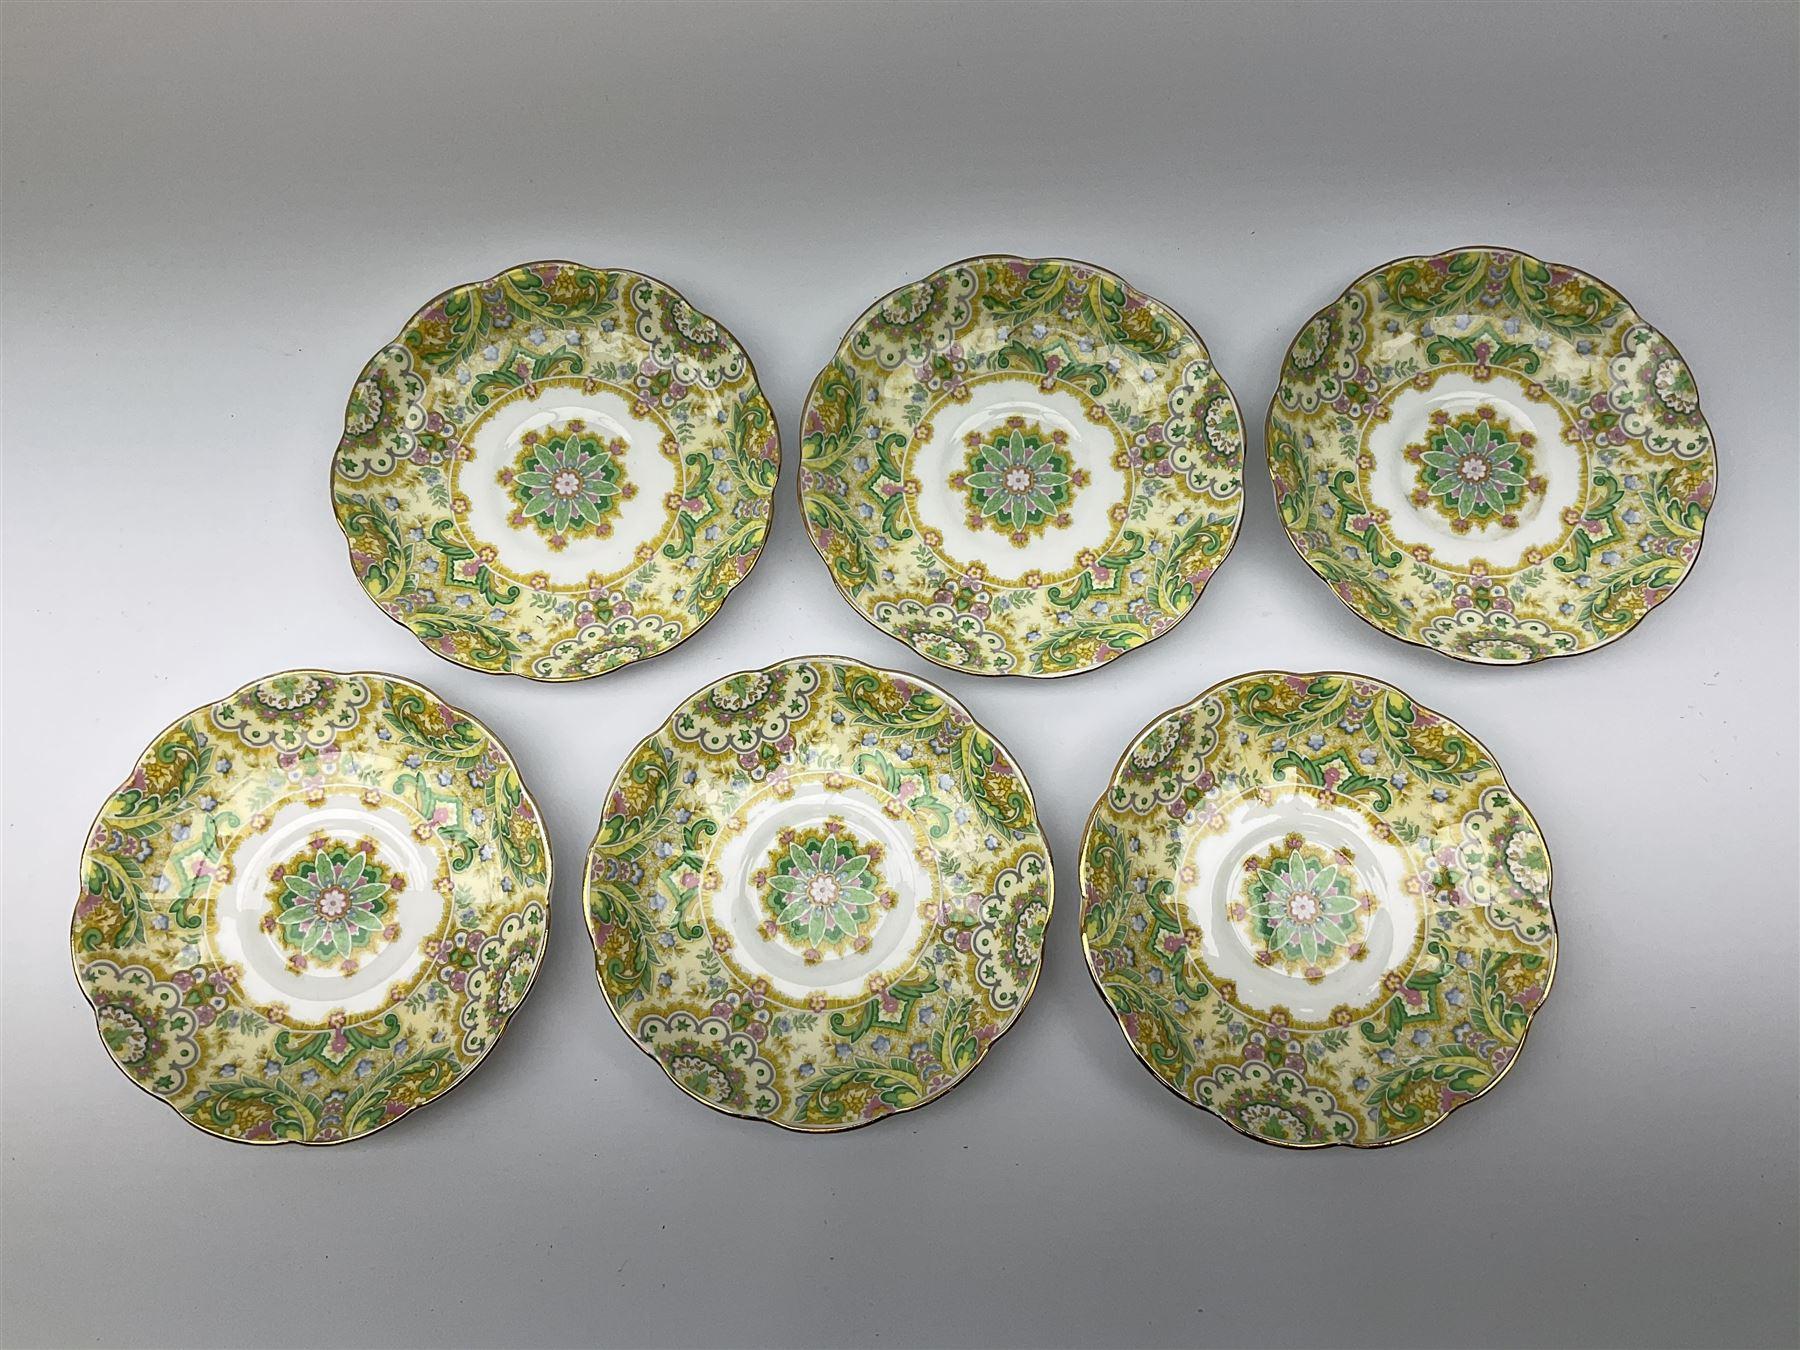 Royal Albert 'Paisley Shawl' pattern part tea set - Image 7 of 12